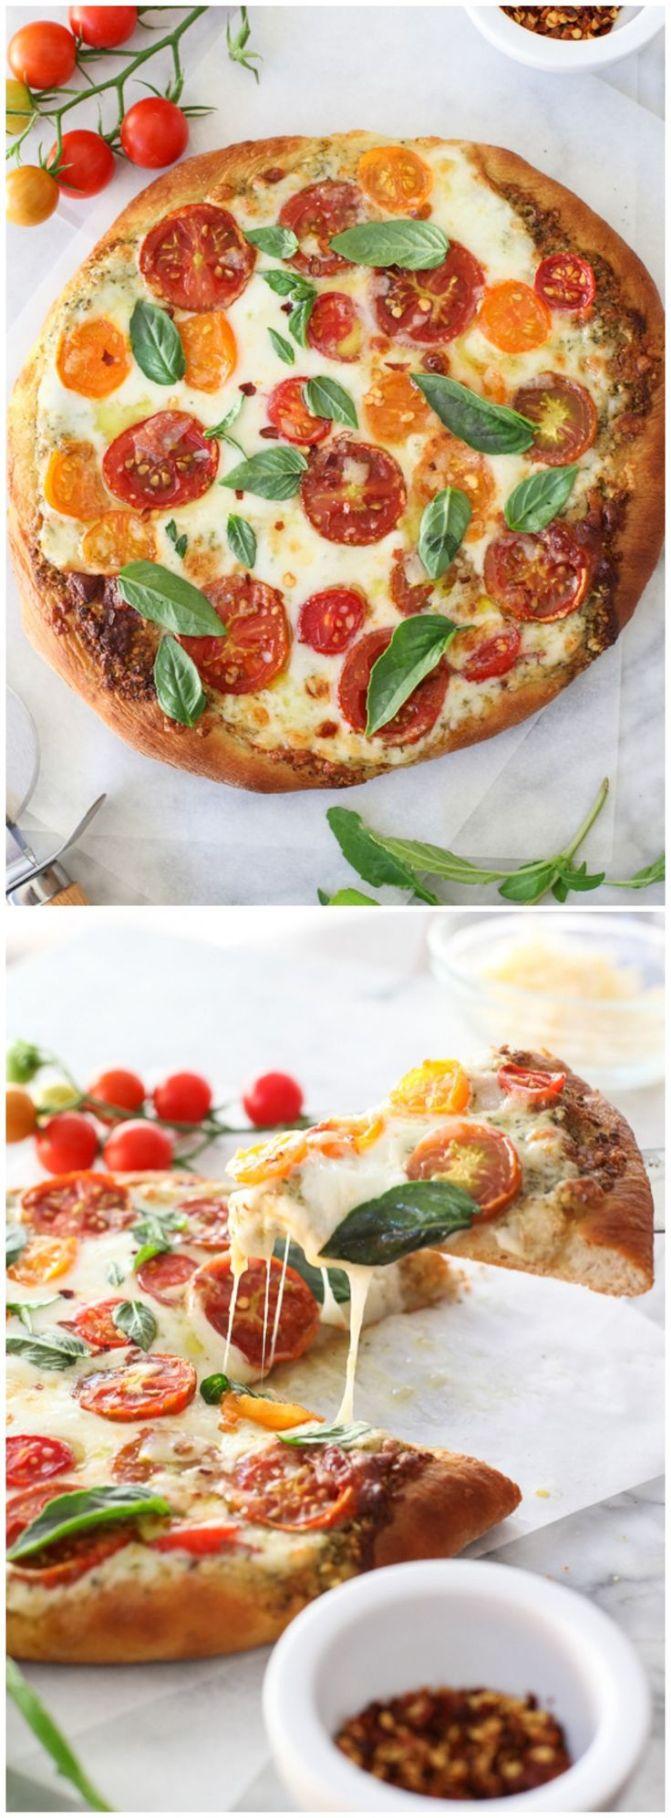 15% off on Tomato Pizza 2